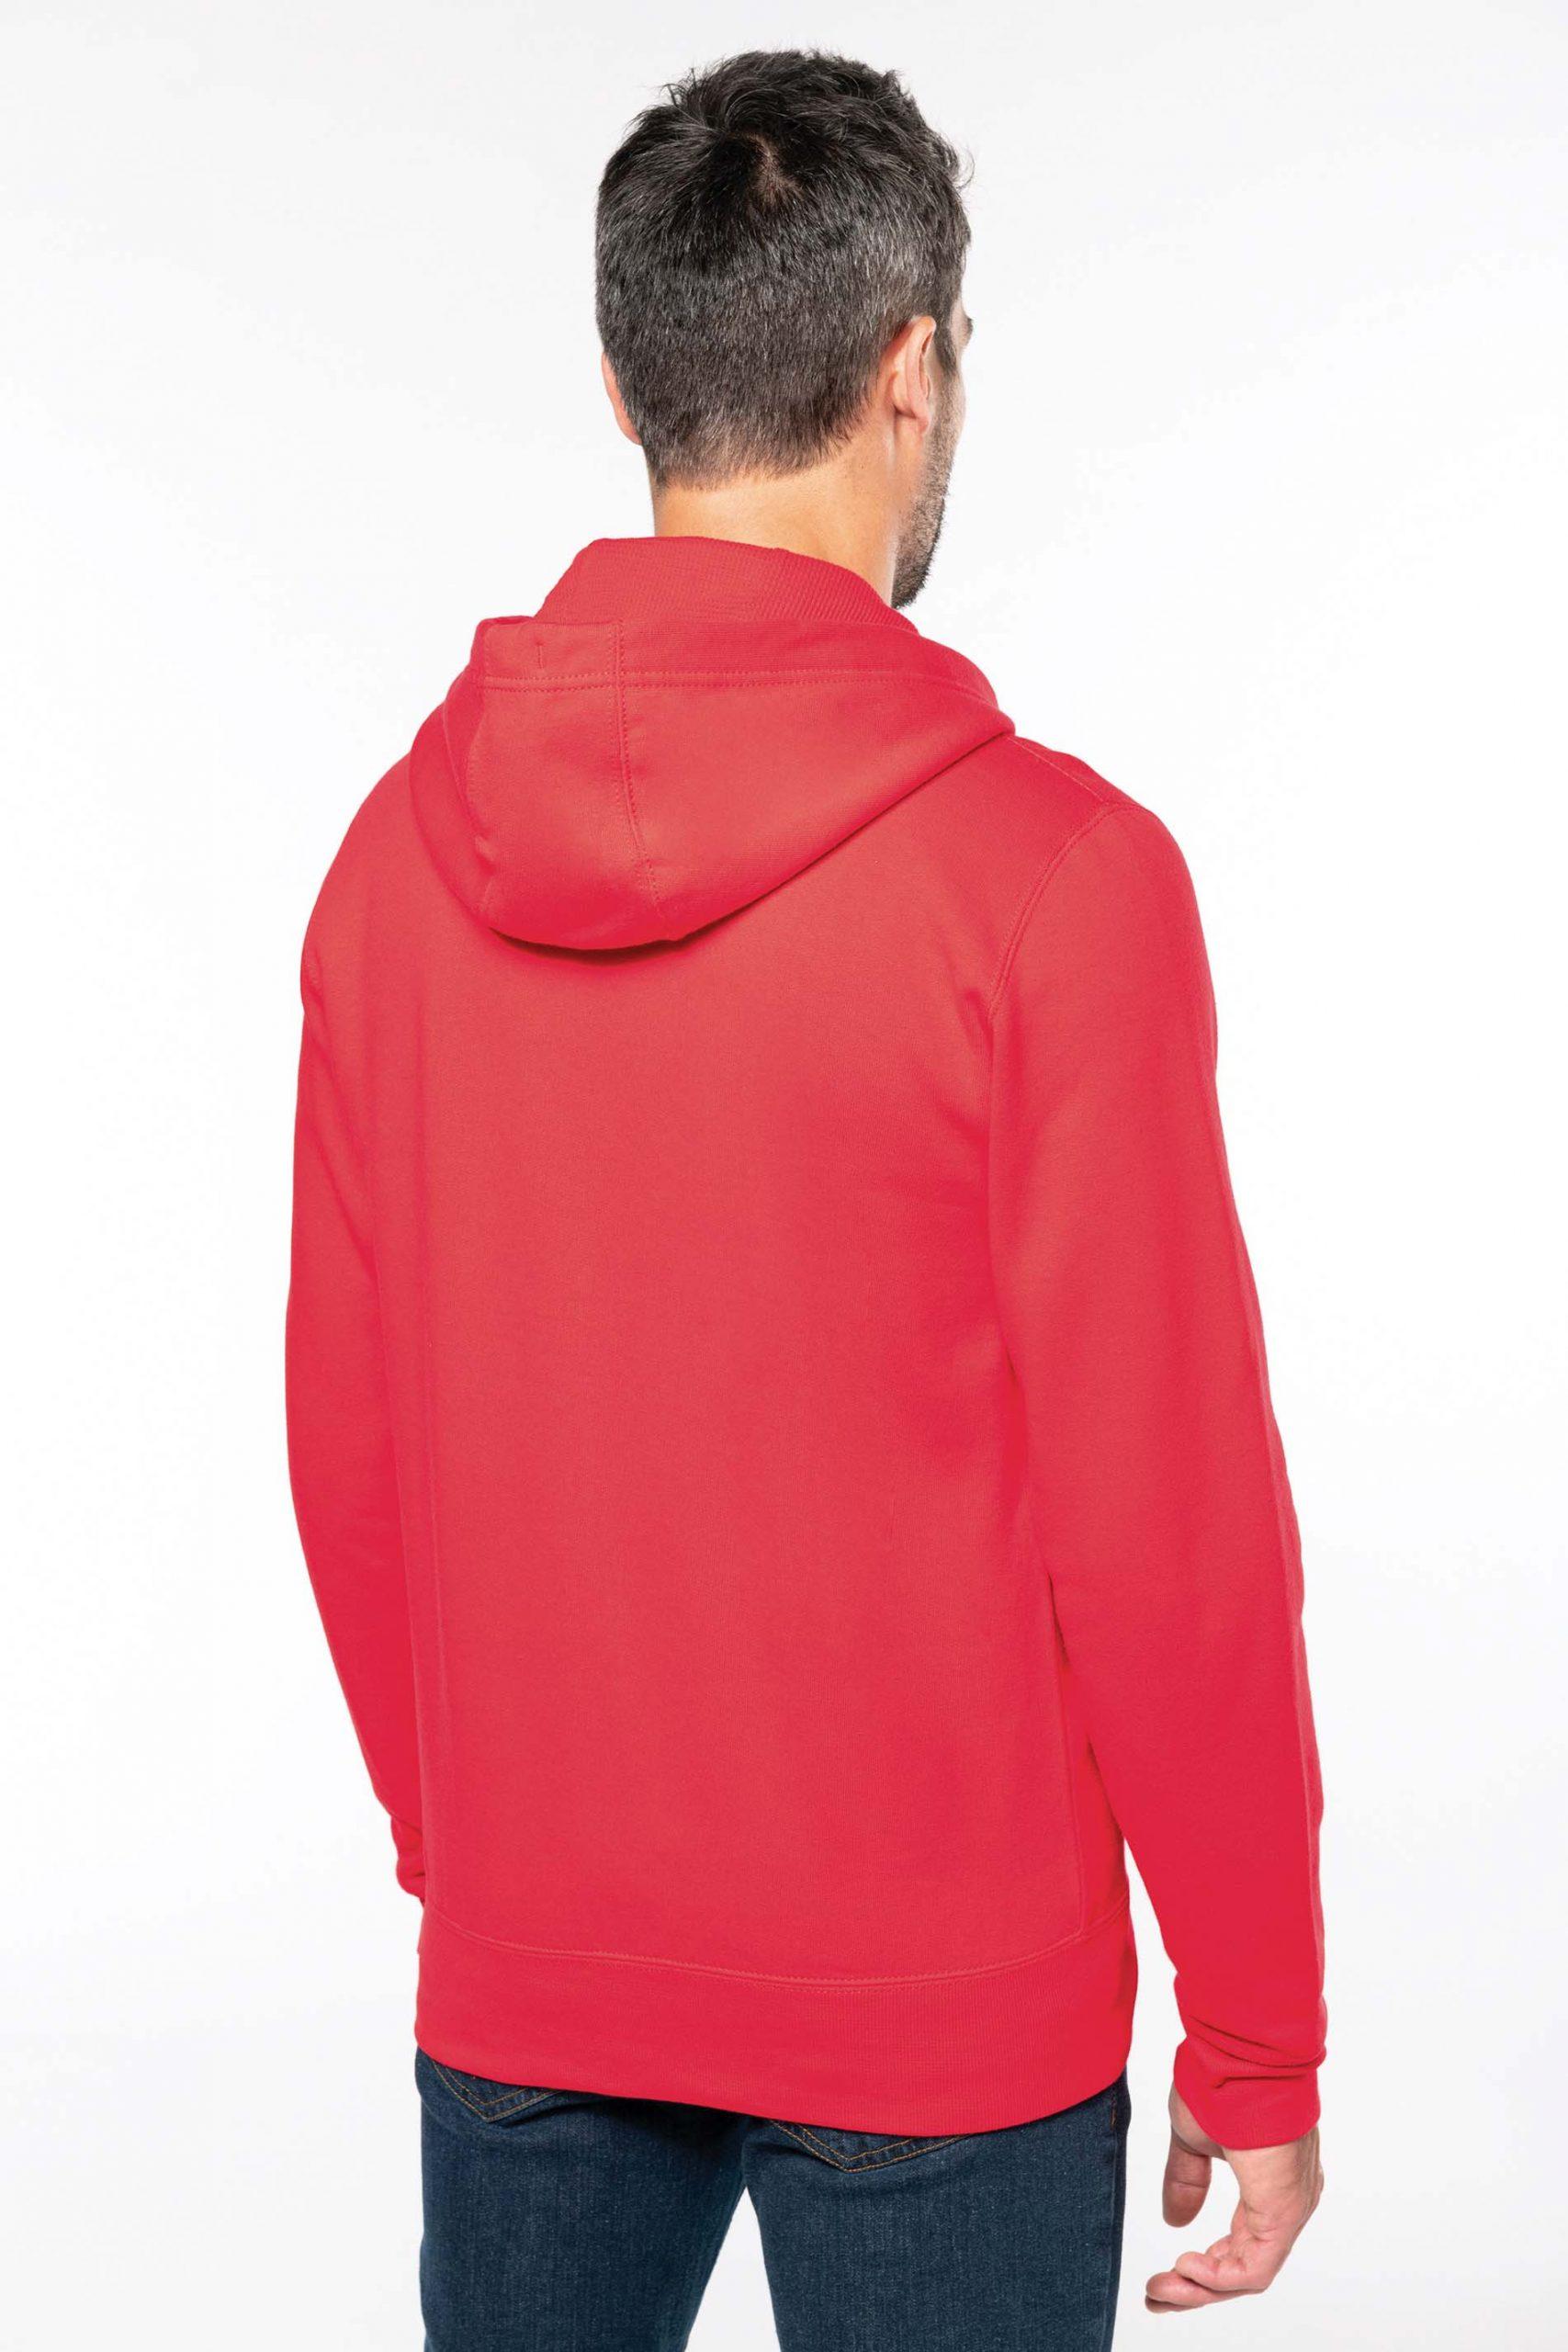 Hooded Sweater Zipped Men